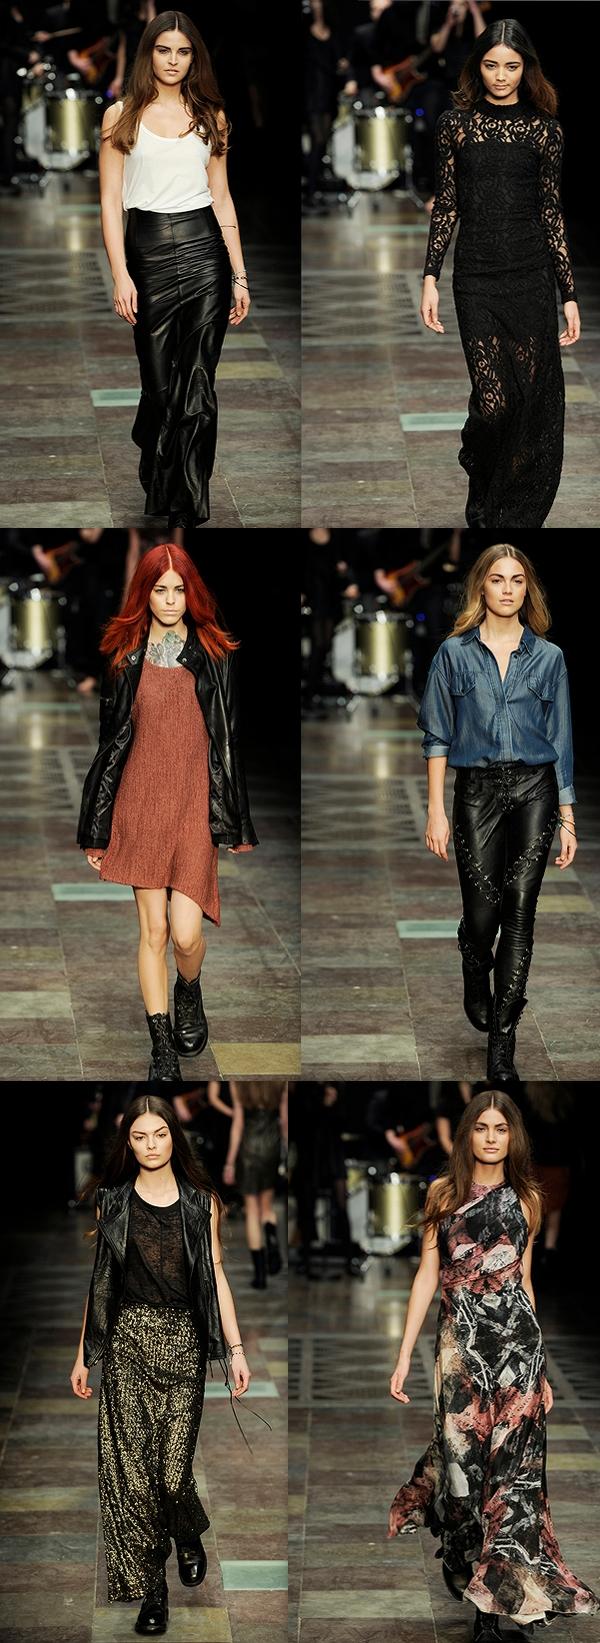 gestuz aw 12, gestuz copenhagen fashion week, snørre læderbukser, paliet maxi nederdel, modeuge